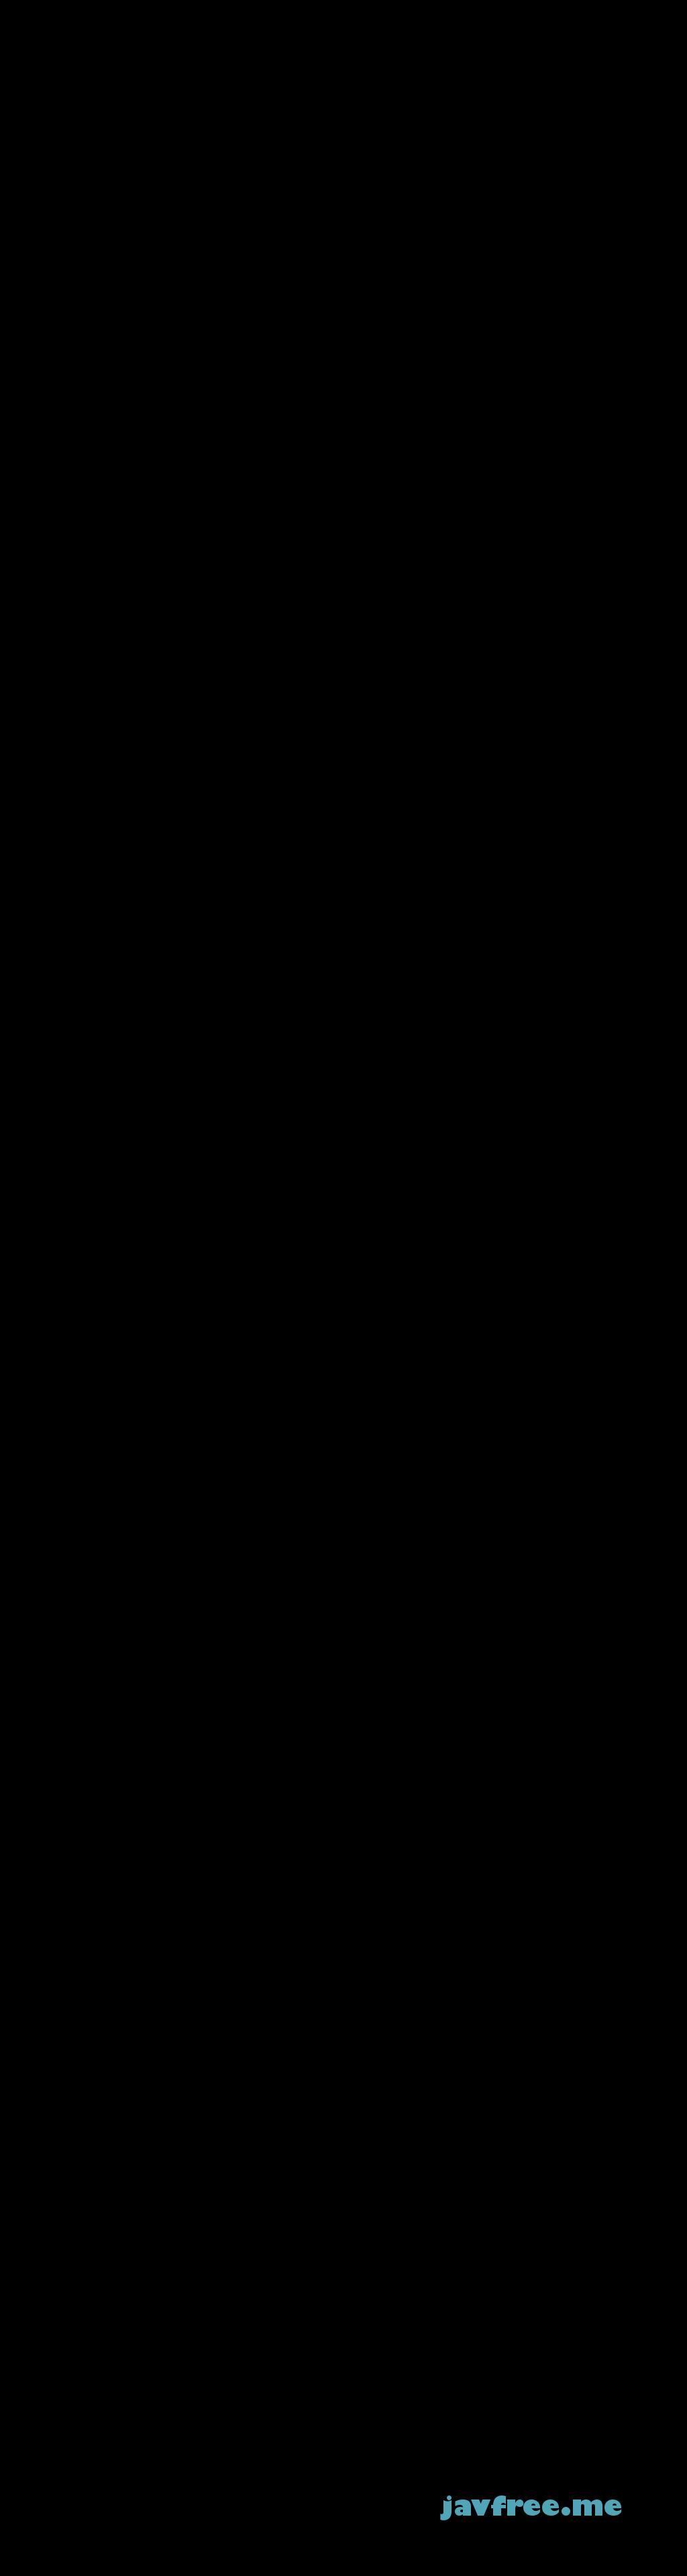 [AAJB-130] 【AV30】完全生涯保存版 永遠なる淫舞 美しき女神たち - image AAJB-130c on https://javfree.me